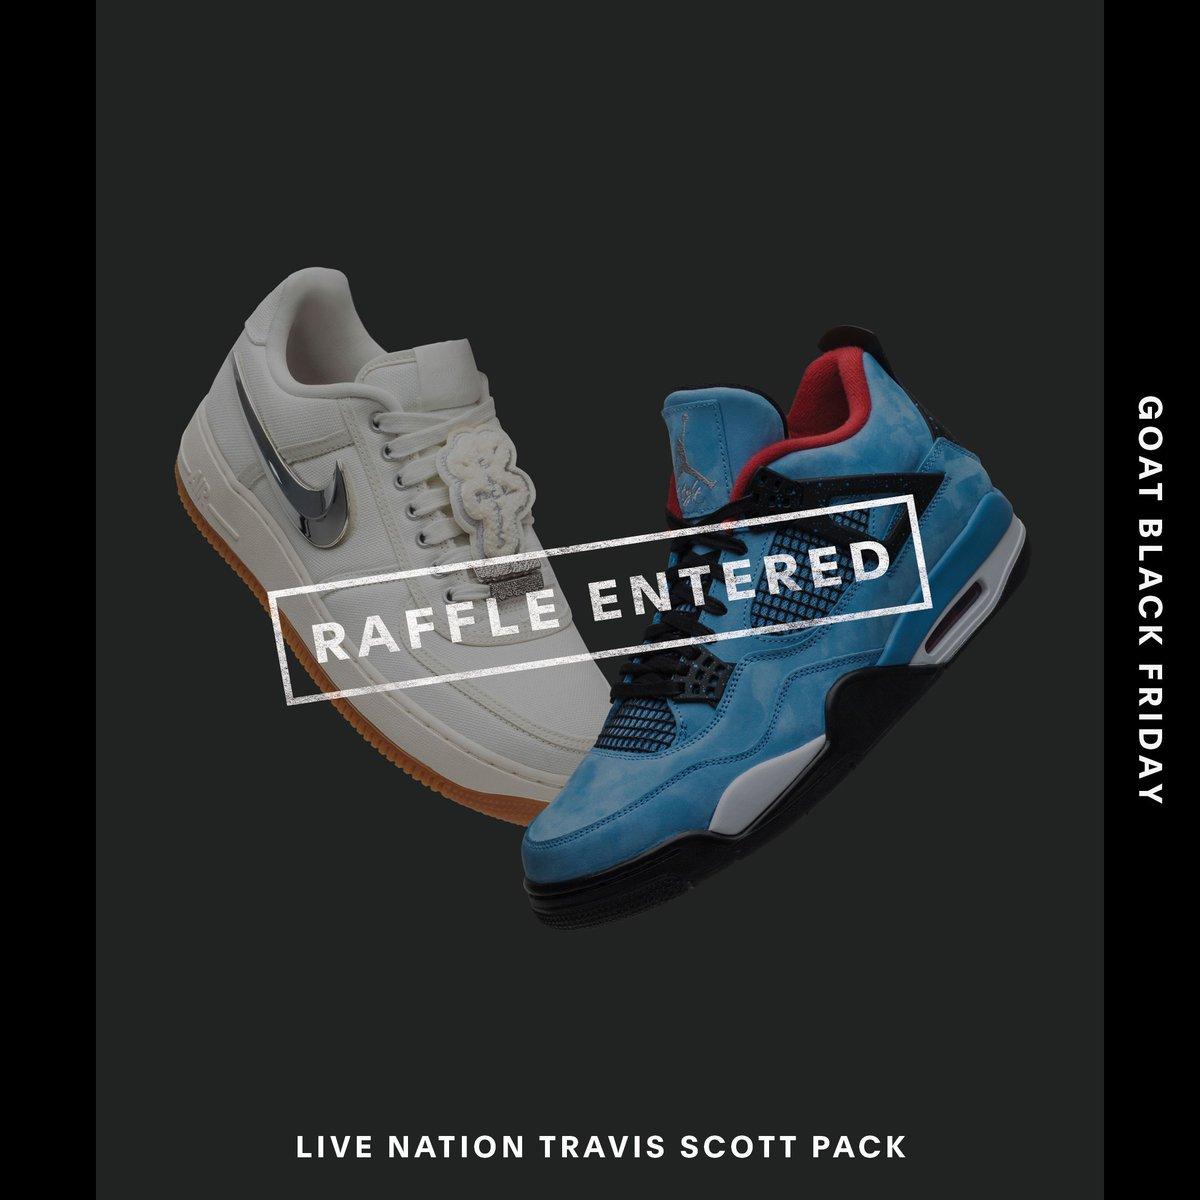 f67046411ce4 Enter to win the exclusive Travis Scott Pack including the Travis Scott  Jordan 4  Cactus Jack